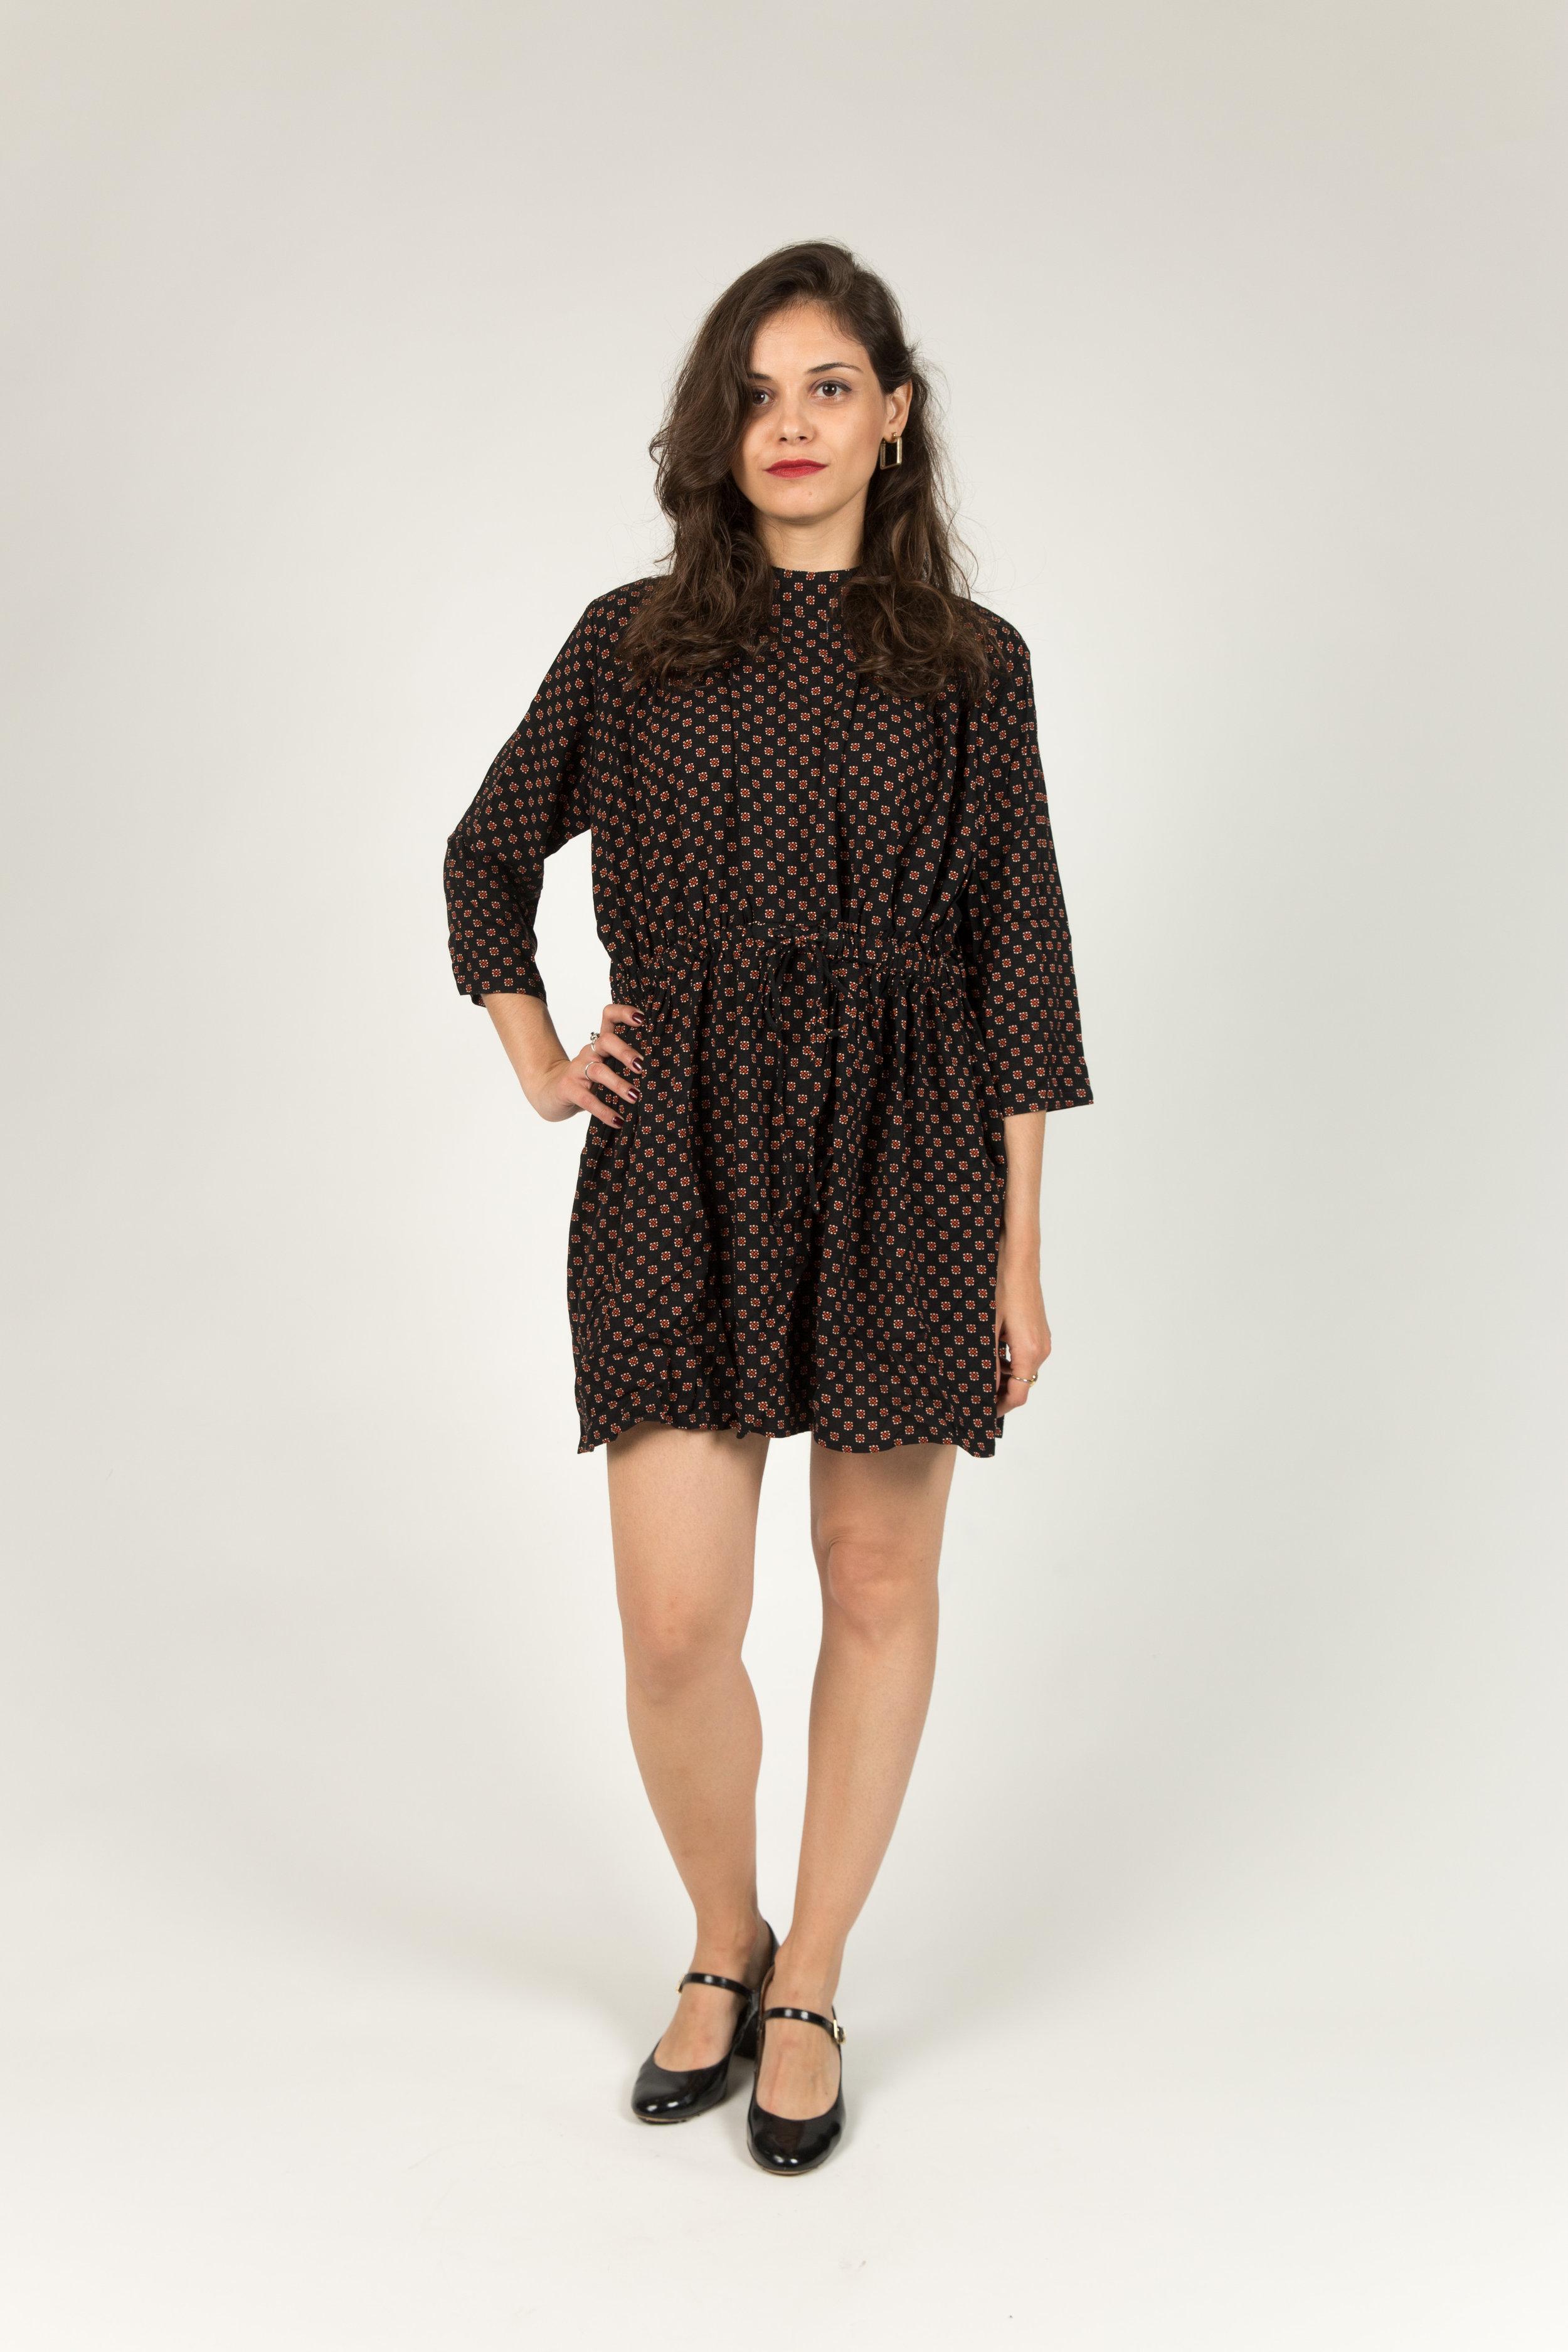 ALINE BLACK DRESS100% COTTON -